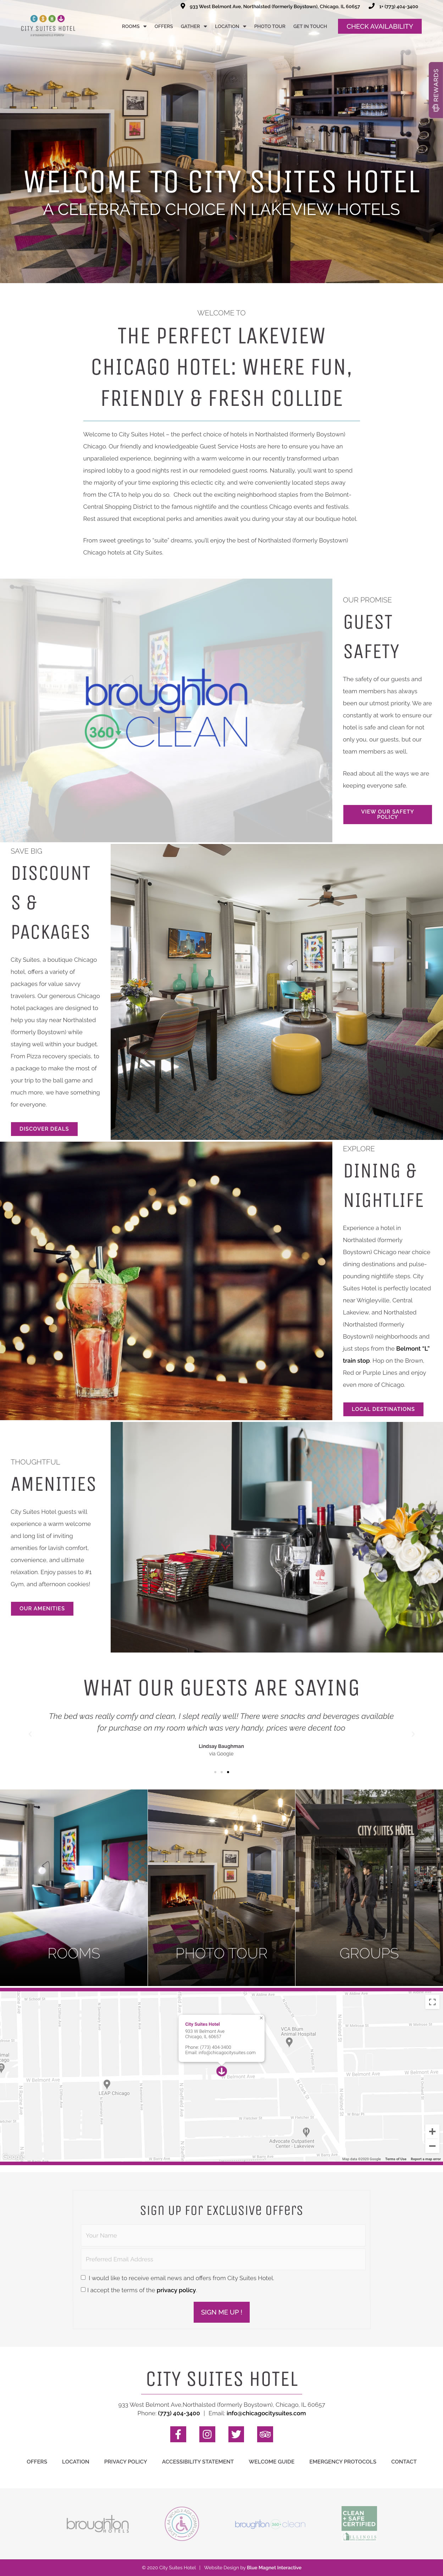 web design example city suites